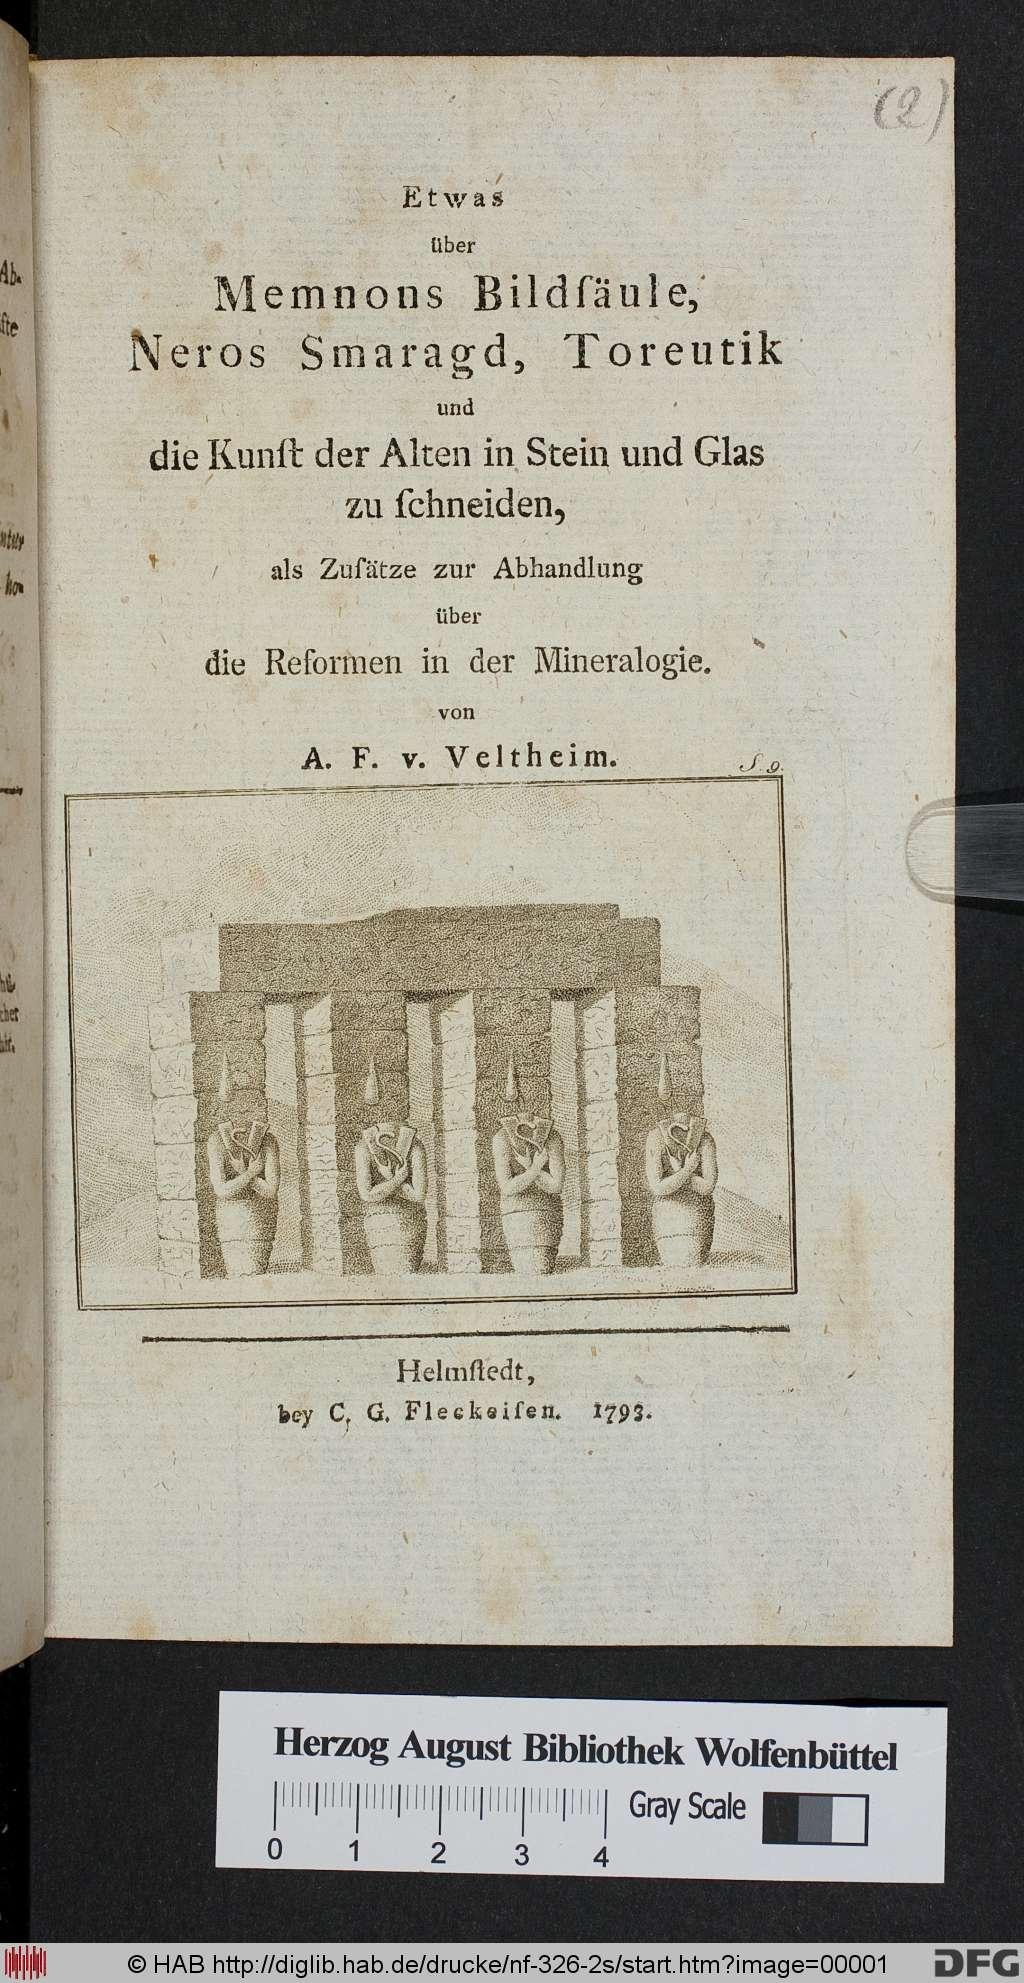 http://diglib.hab.de/drucke/nf-326-2s/00001.jpg